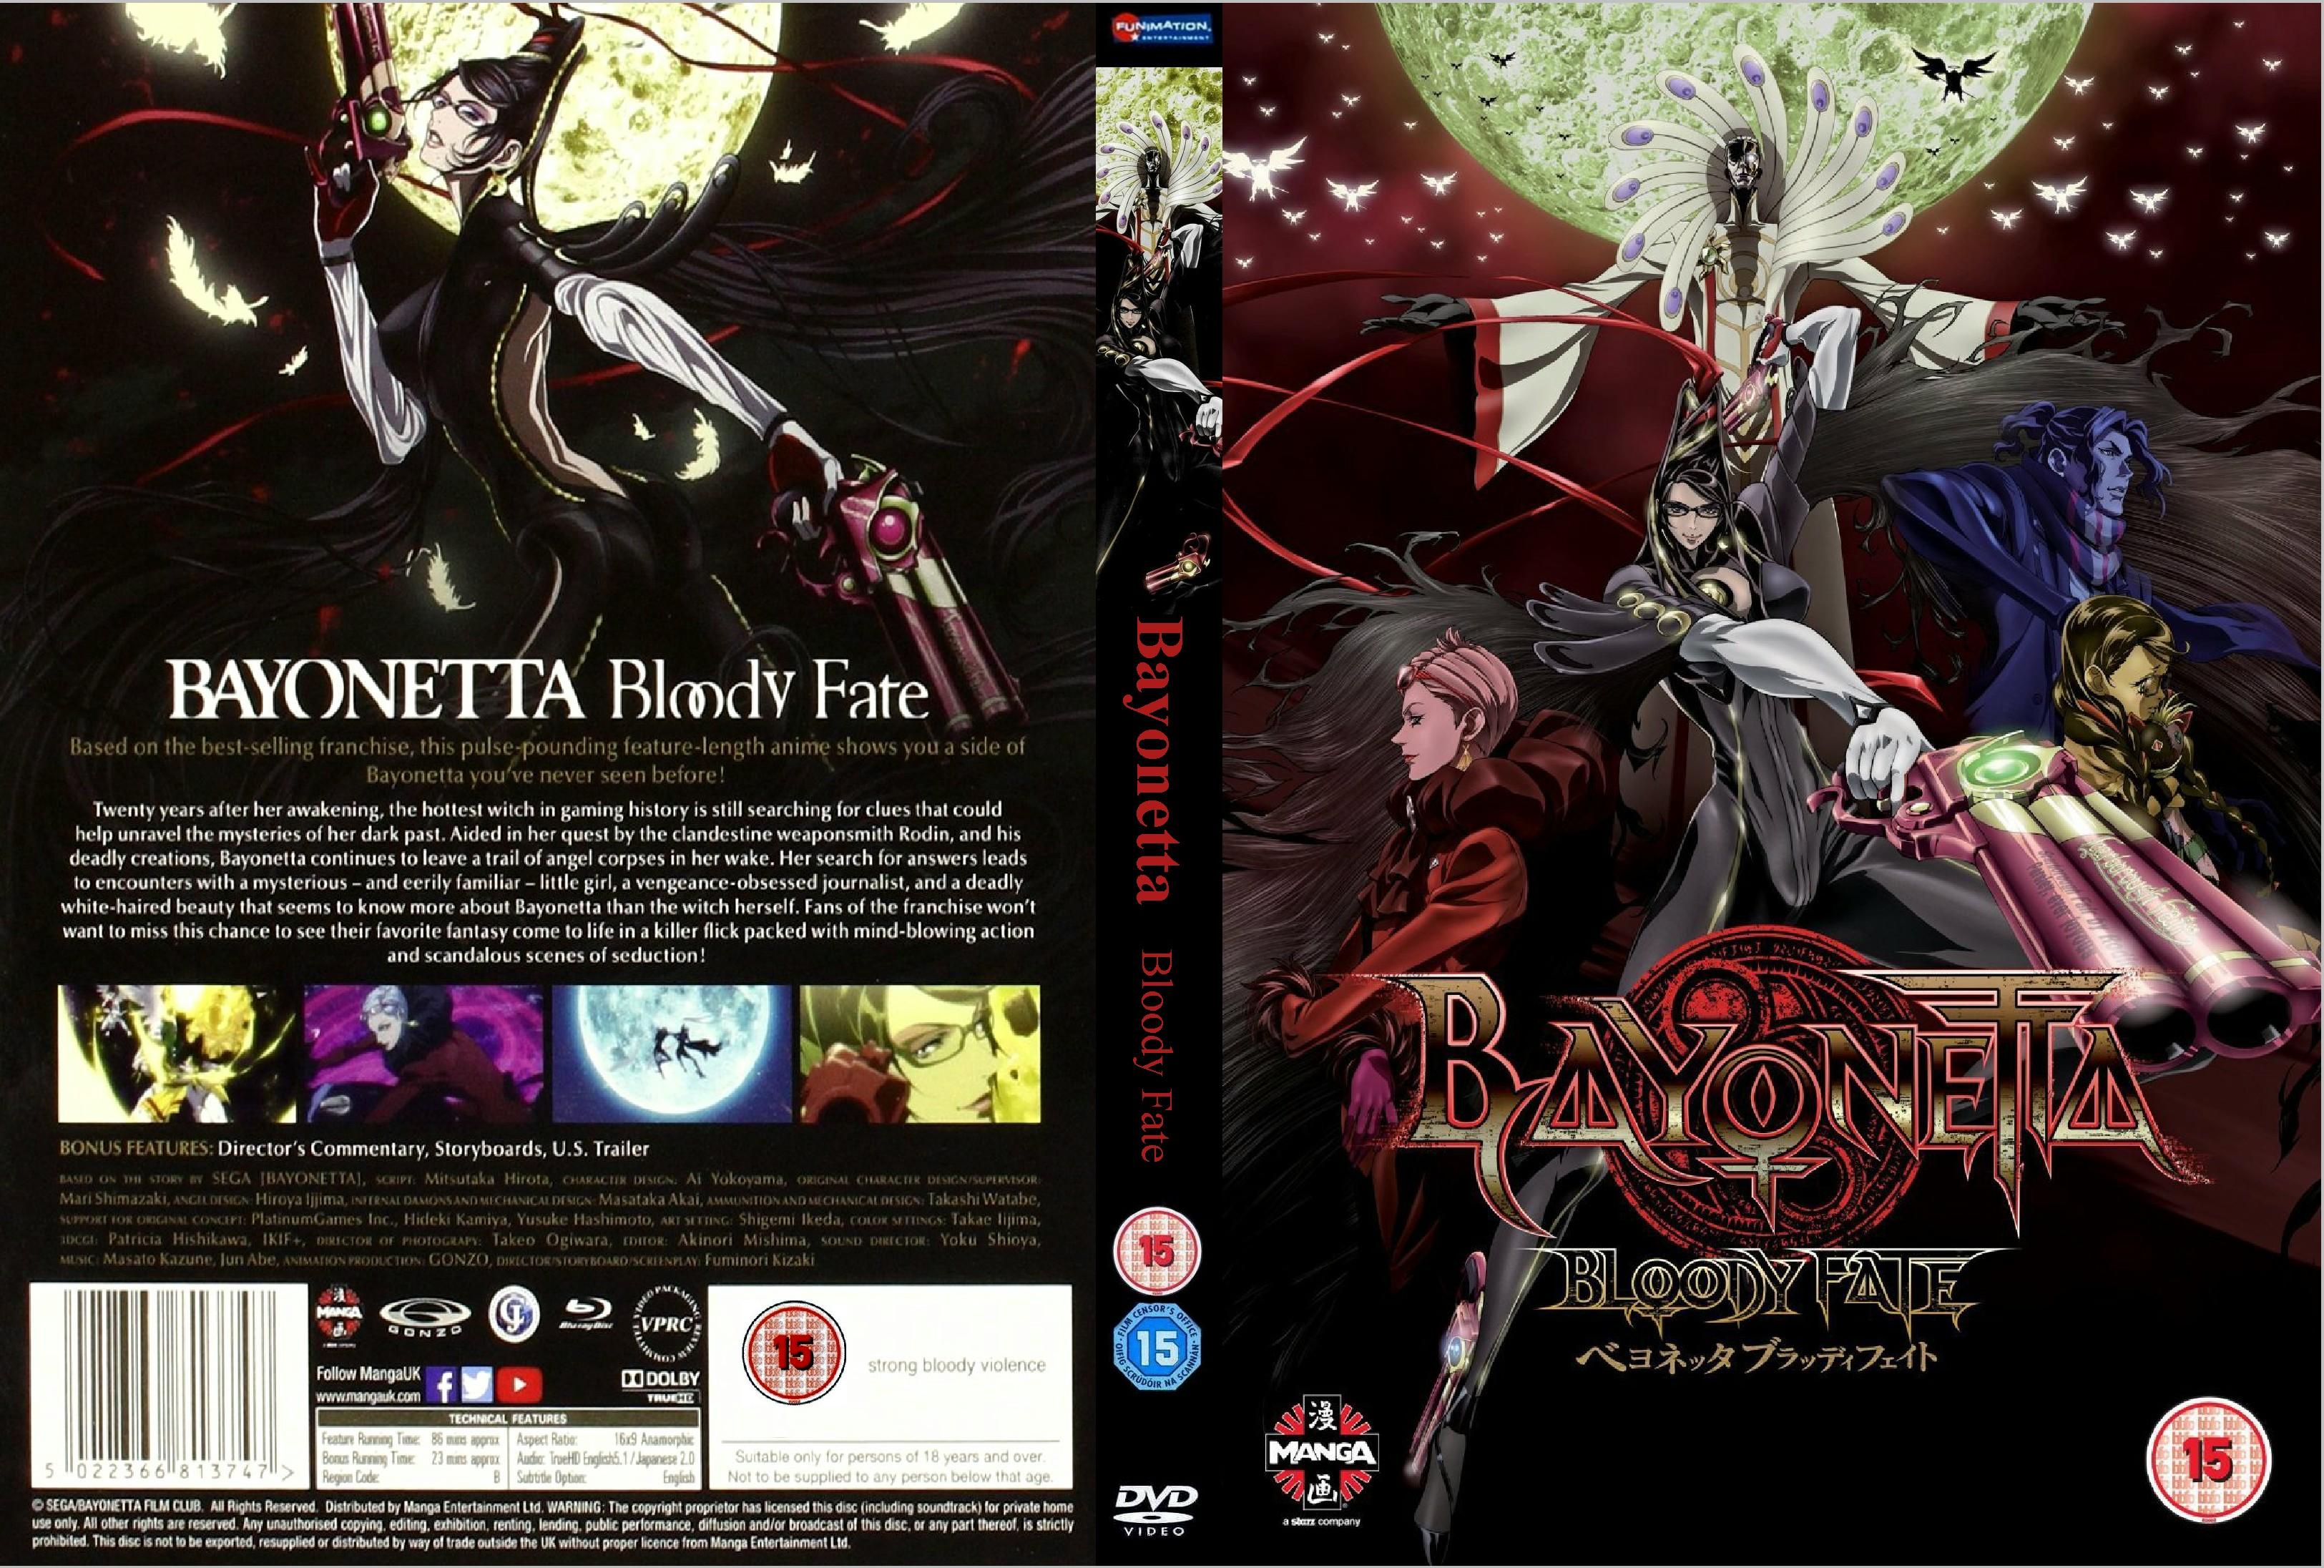 BAYONETTA: BLOODY FATE THE MOVIE DVD ANIME English